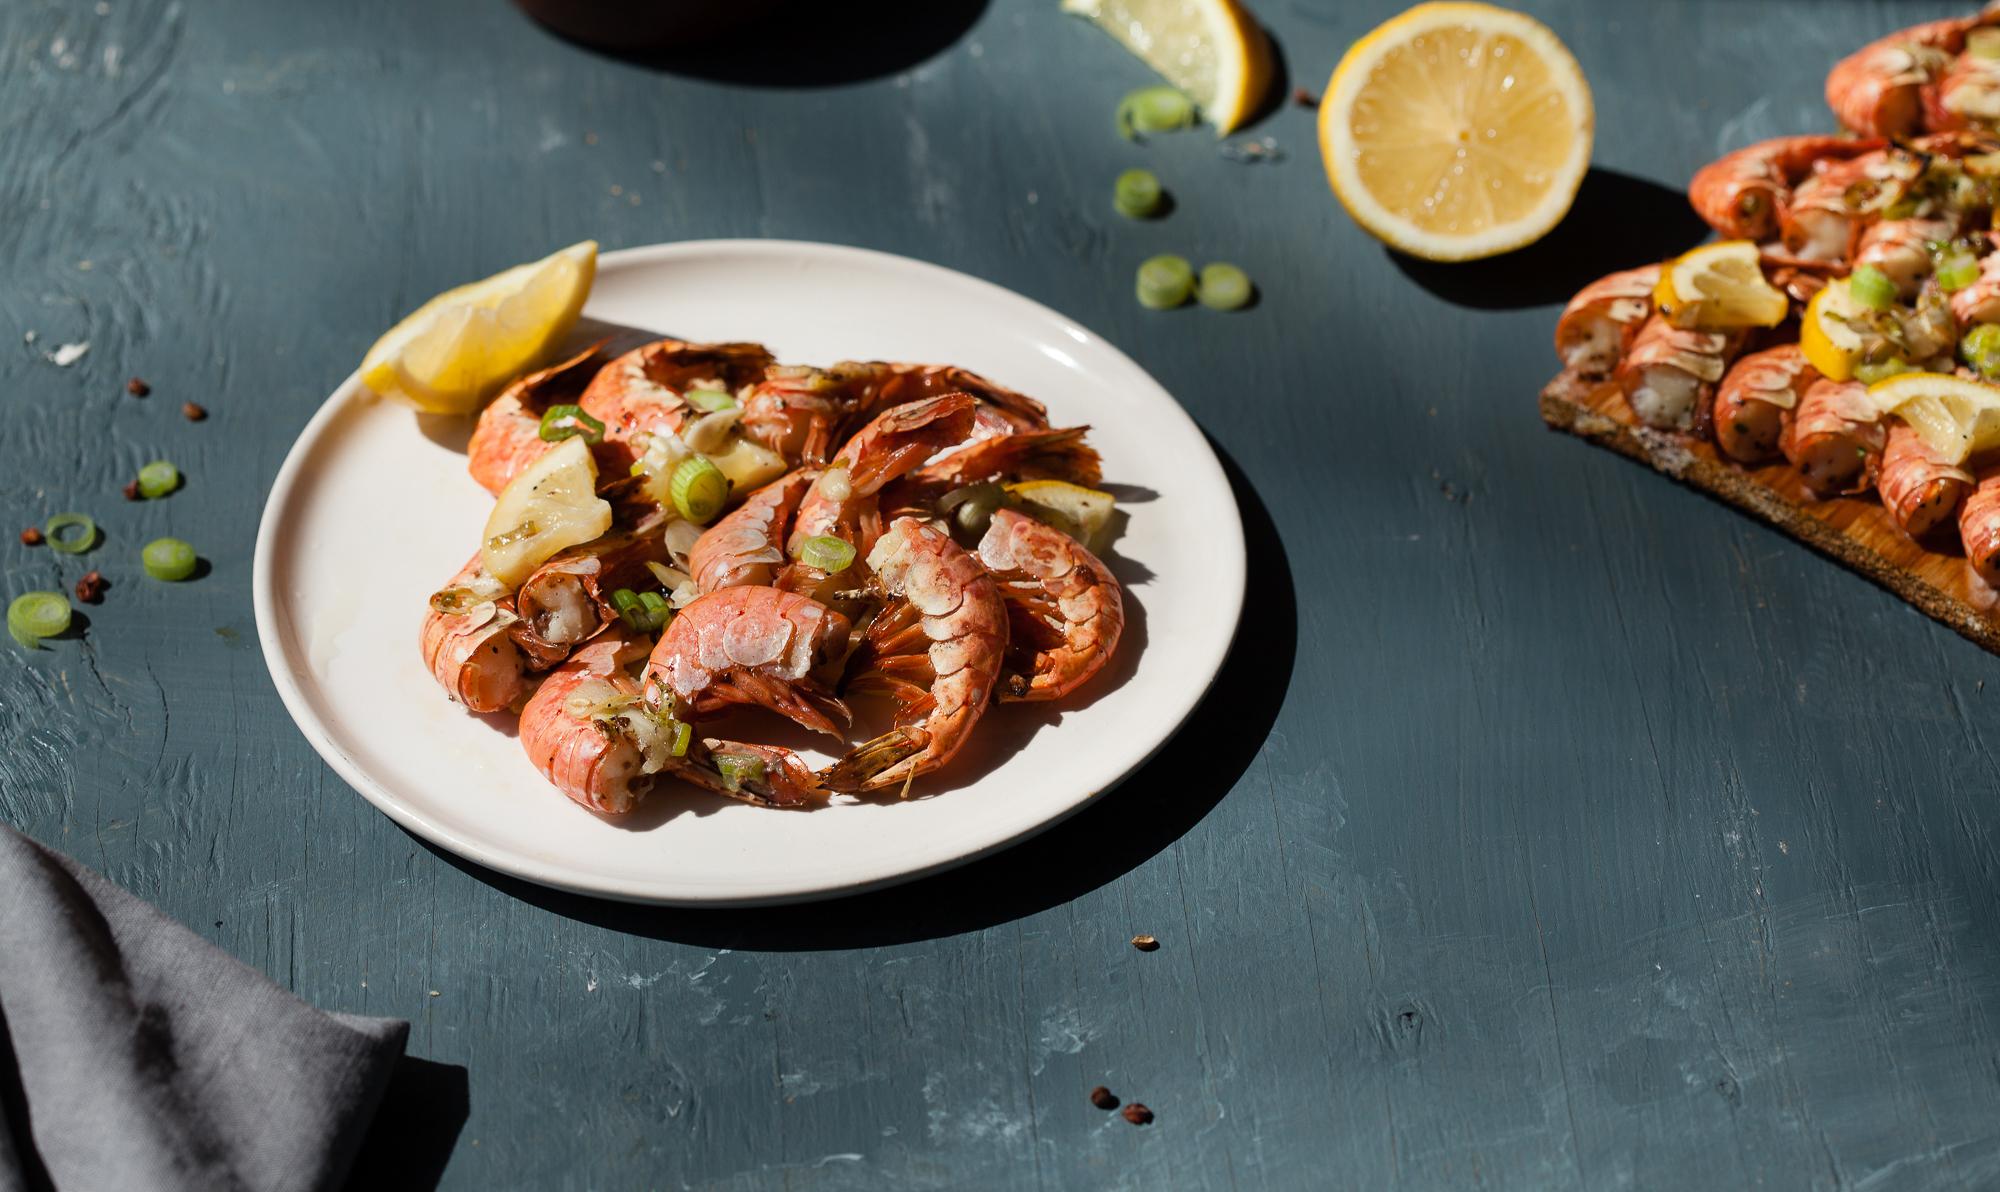 Cedar Planked Red Shrimp with Szechuan Pepper, Garlic, and Green Onion Aioli